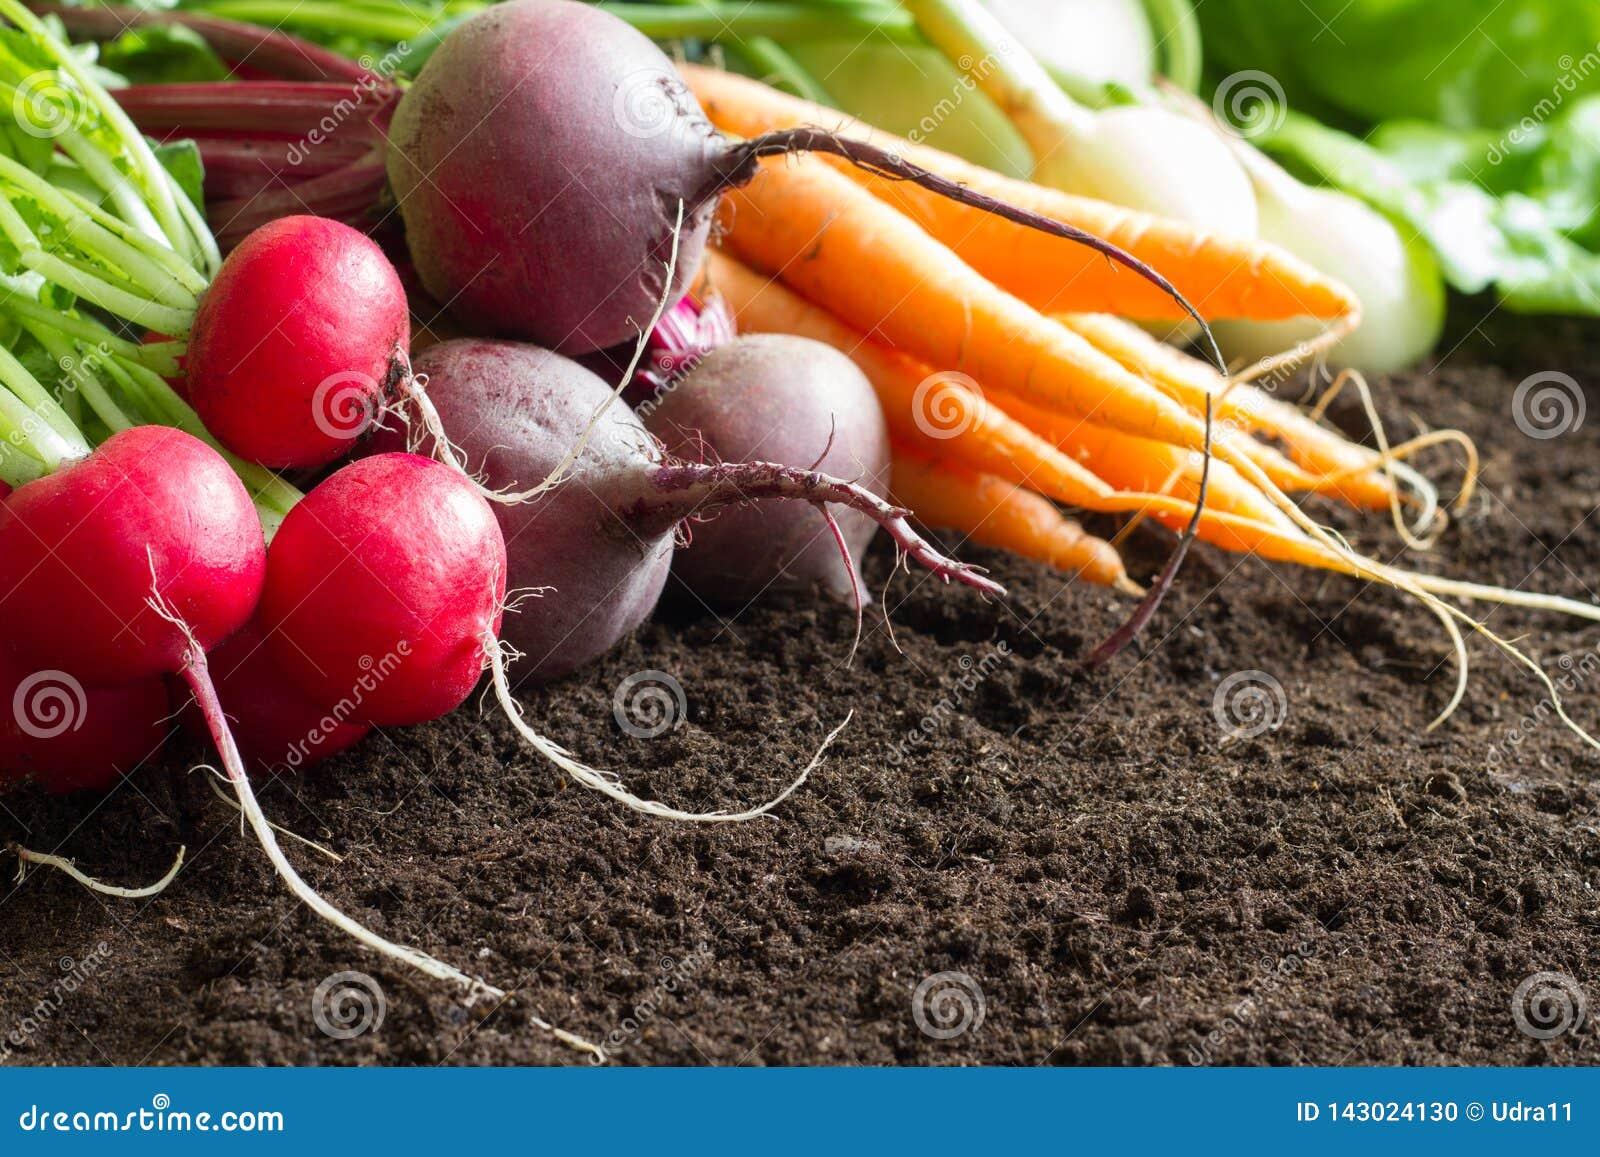 Fresh raw spring vegetables harvest in the garden organic background concept